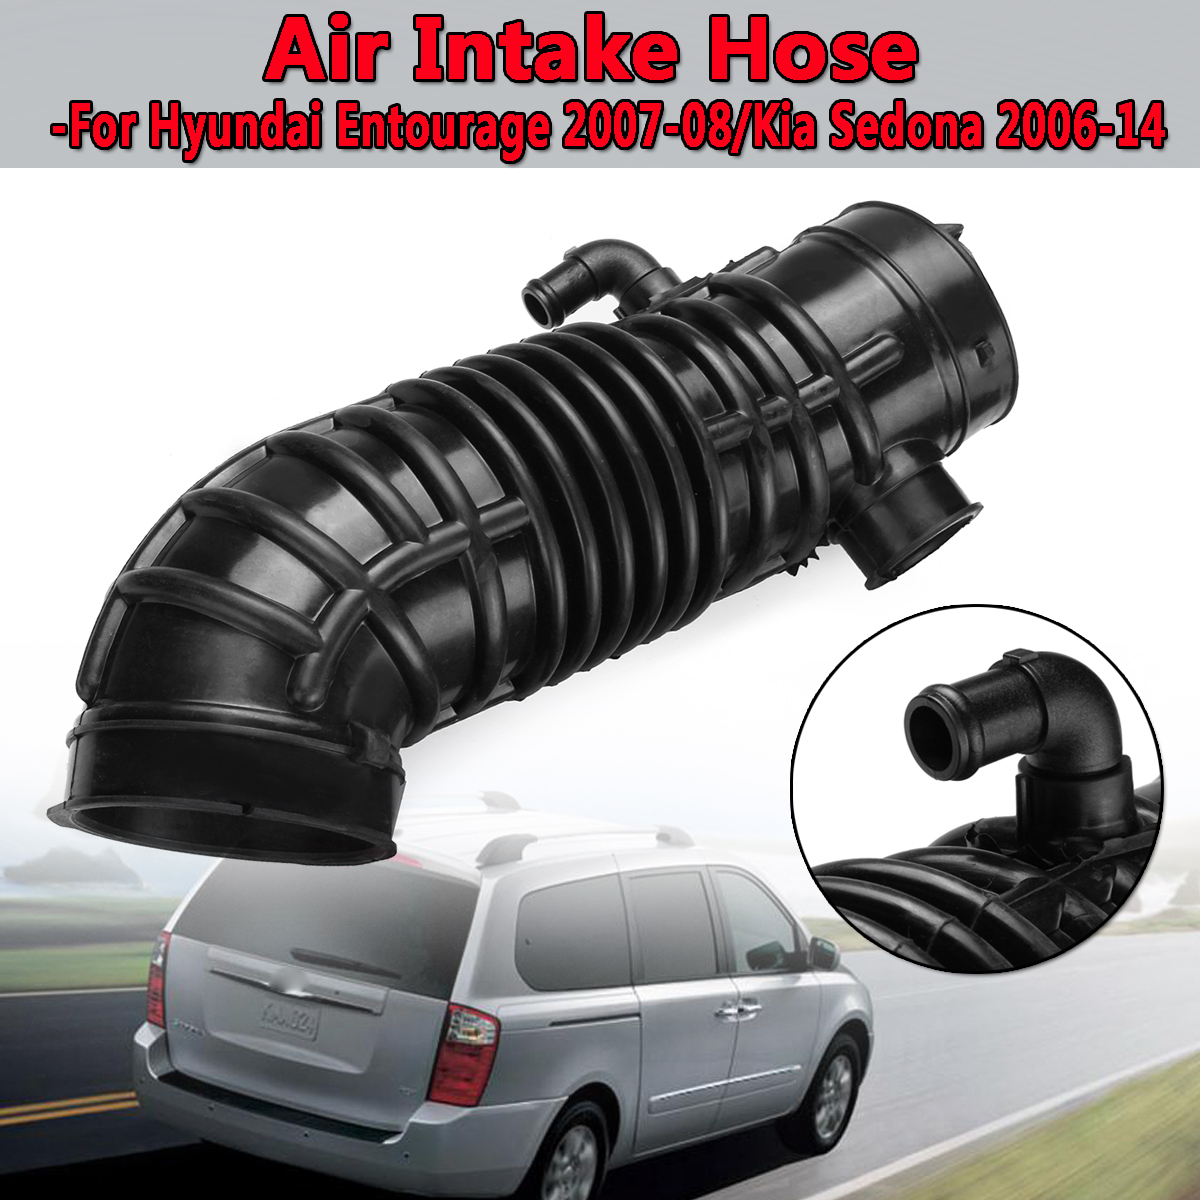 small resolution of engine car air intake hose pipe for hyundai entourage 2007 2008 for kia sedona 2006